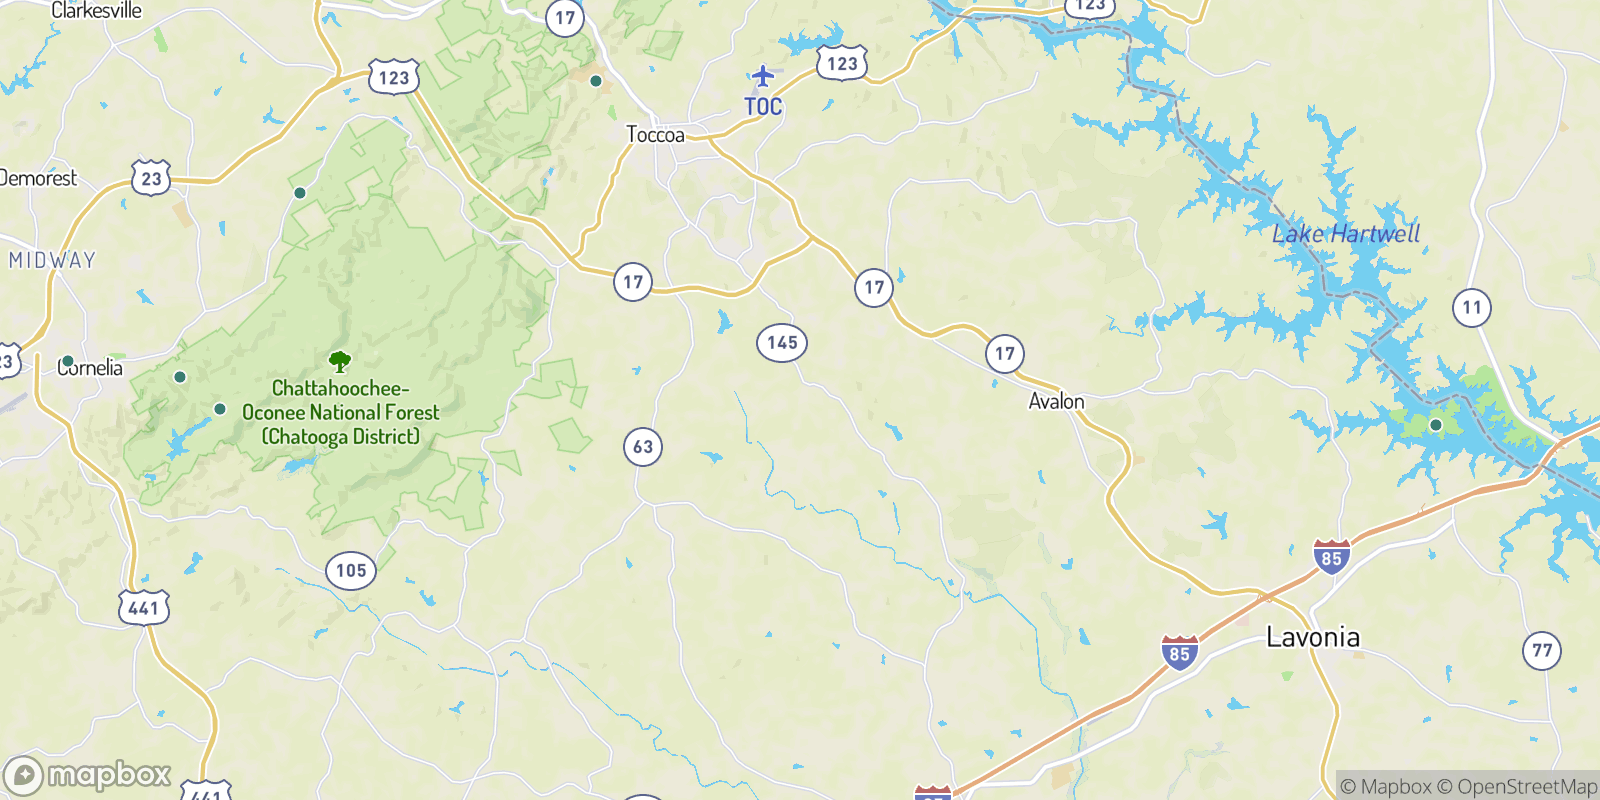 The best camping near Union Hill, Georgia